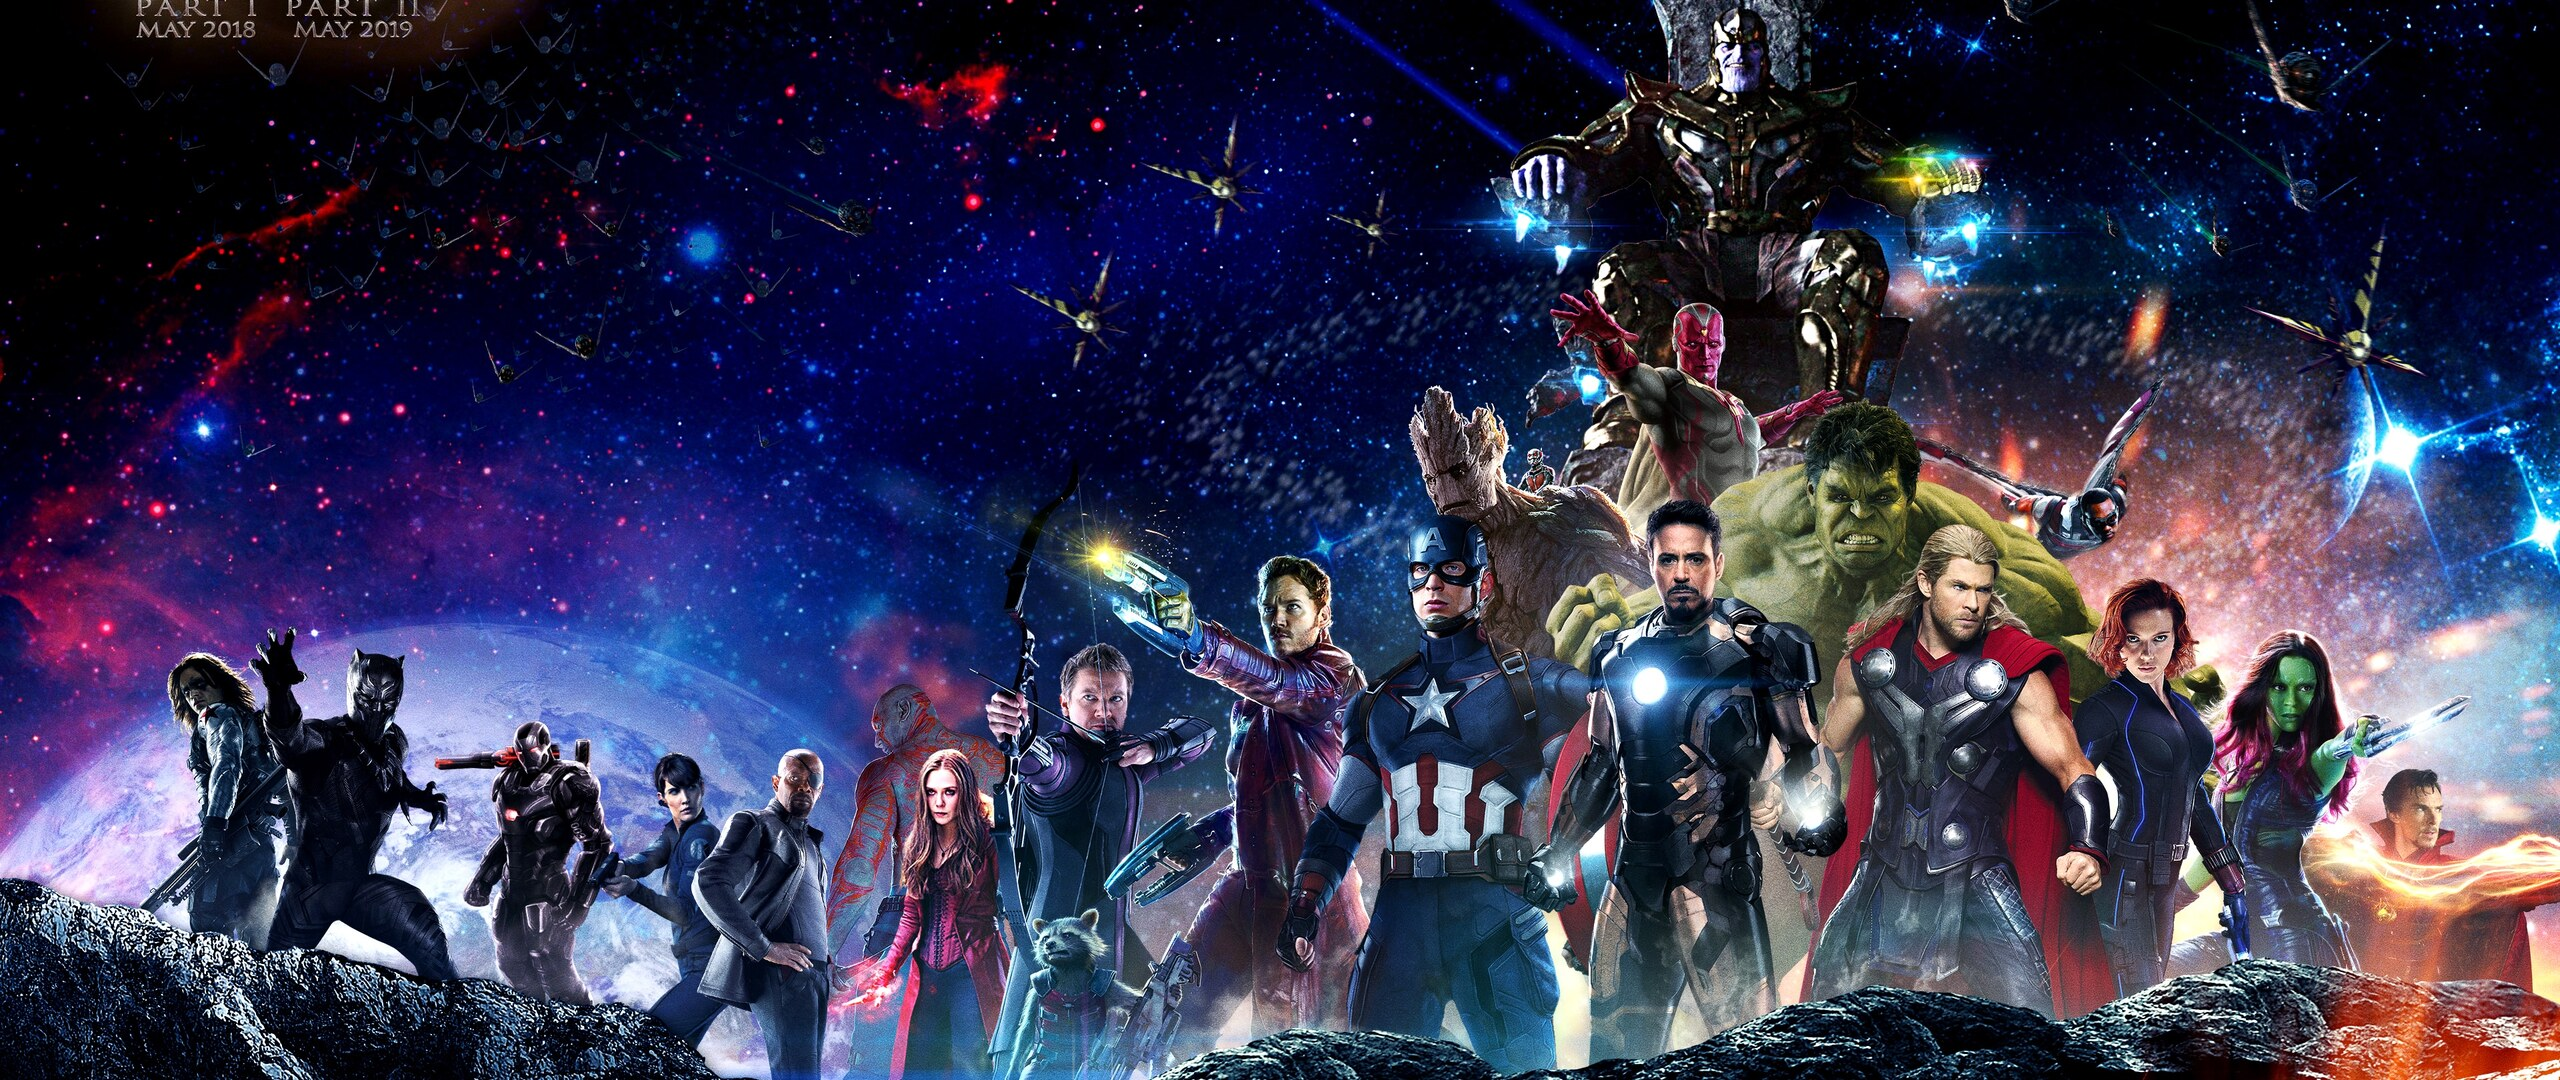 2560x1080 Infinity War Superheroes 4k 2560x1080 Resolution ...